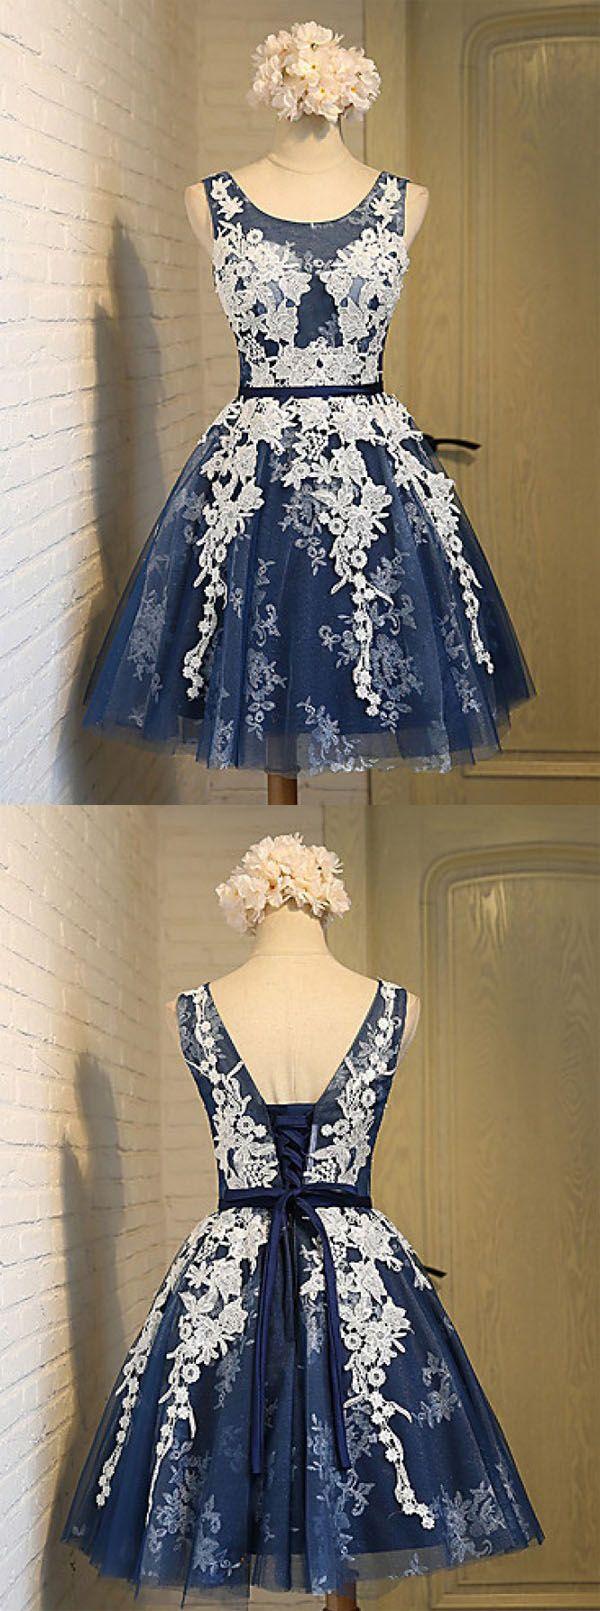 Blue lace homecoming dress